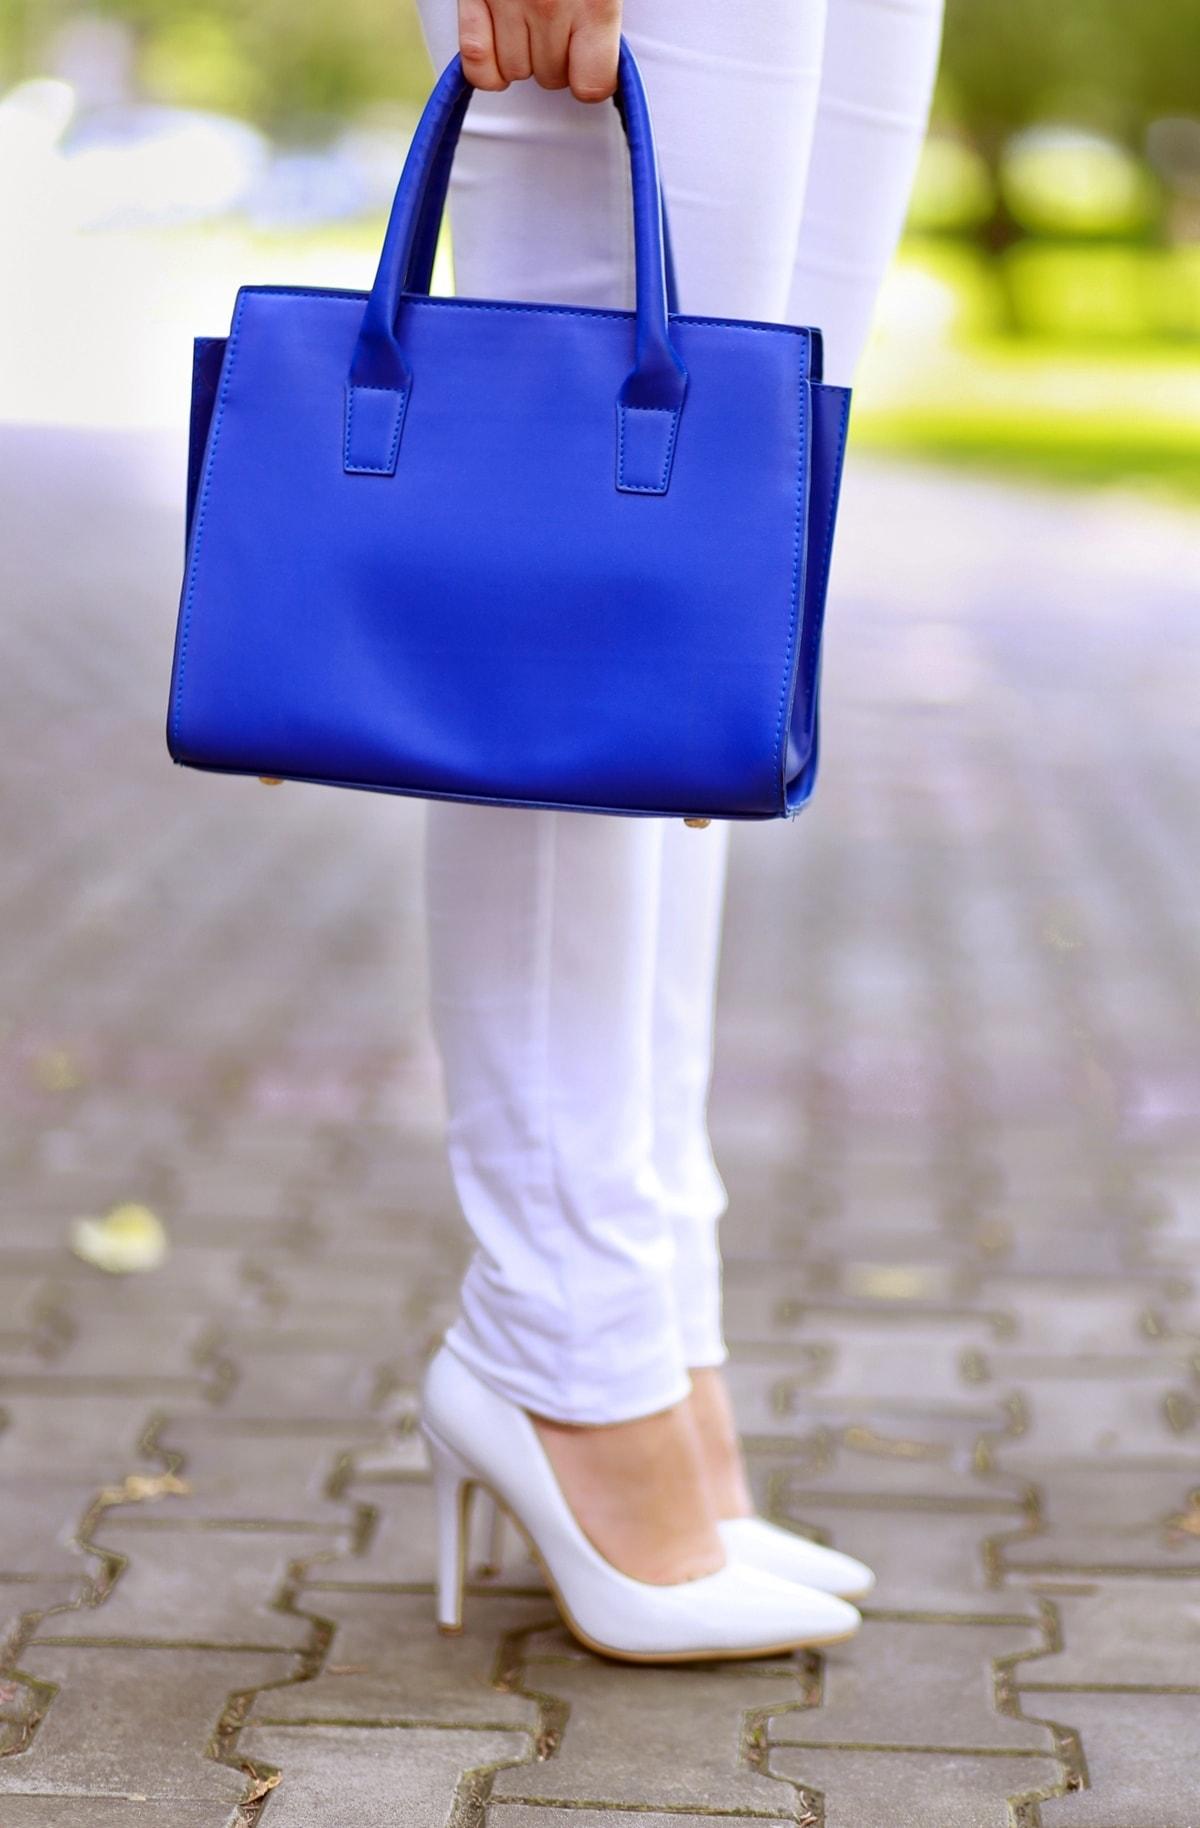 geanta albastra si pantofi albi - tendinte in moda, blogger andreea ristea